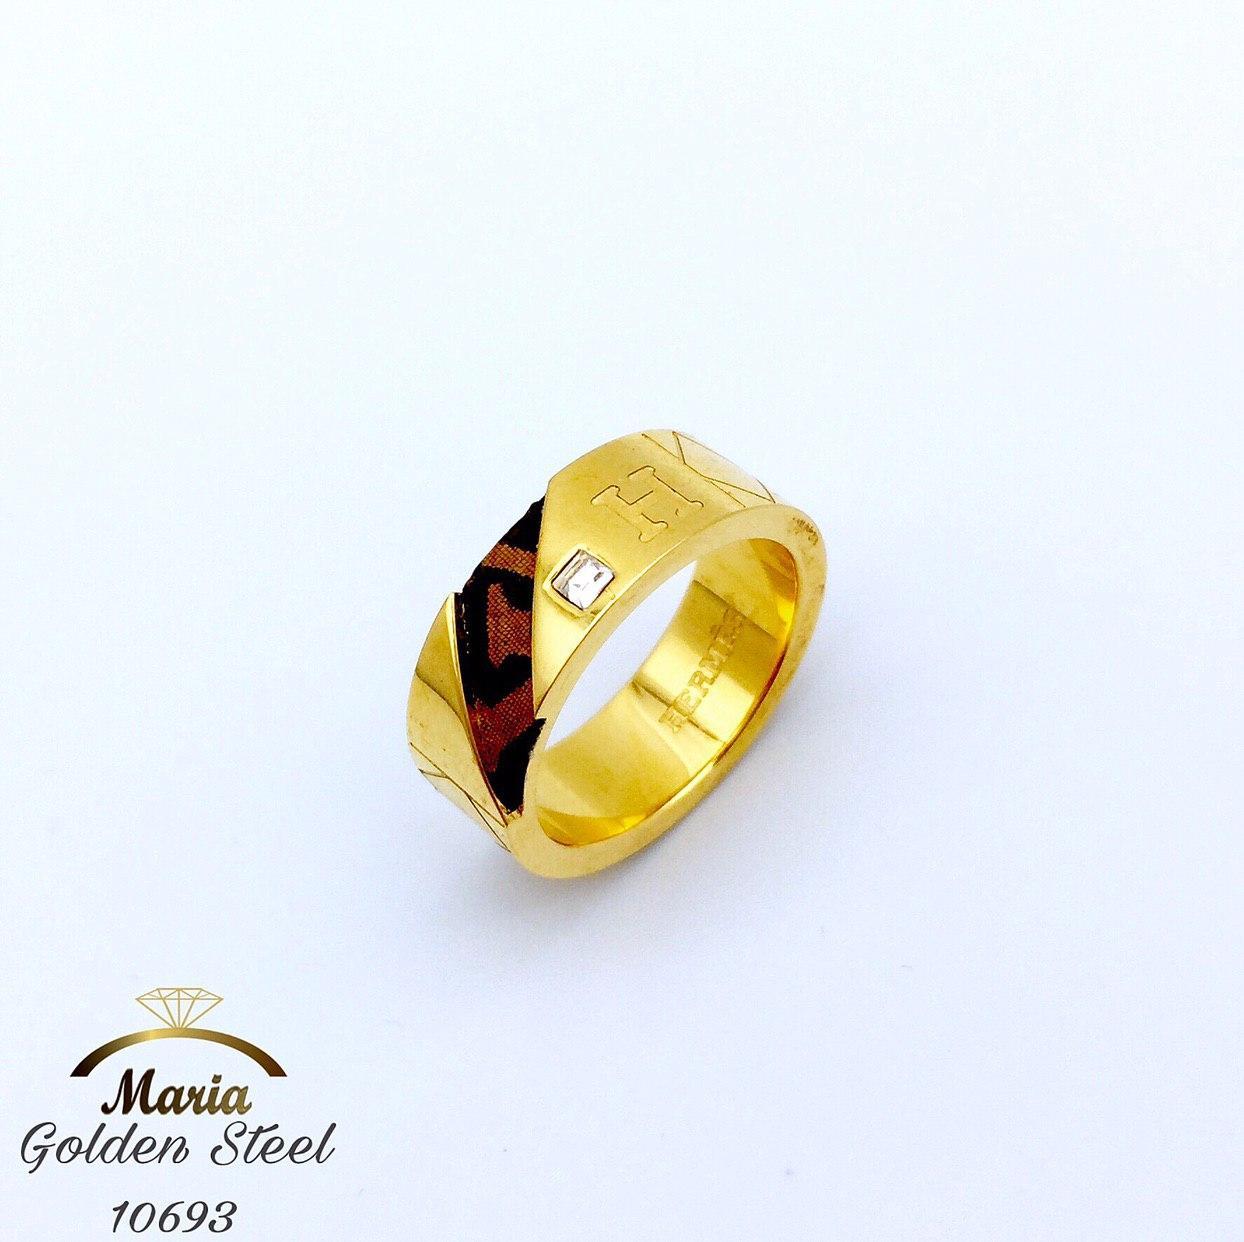 10693  خاتم هيرمز ستانلس